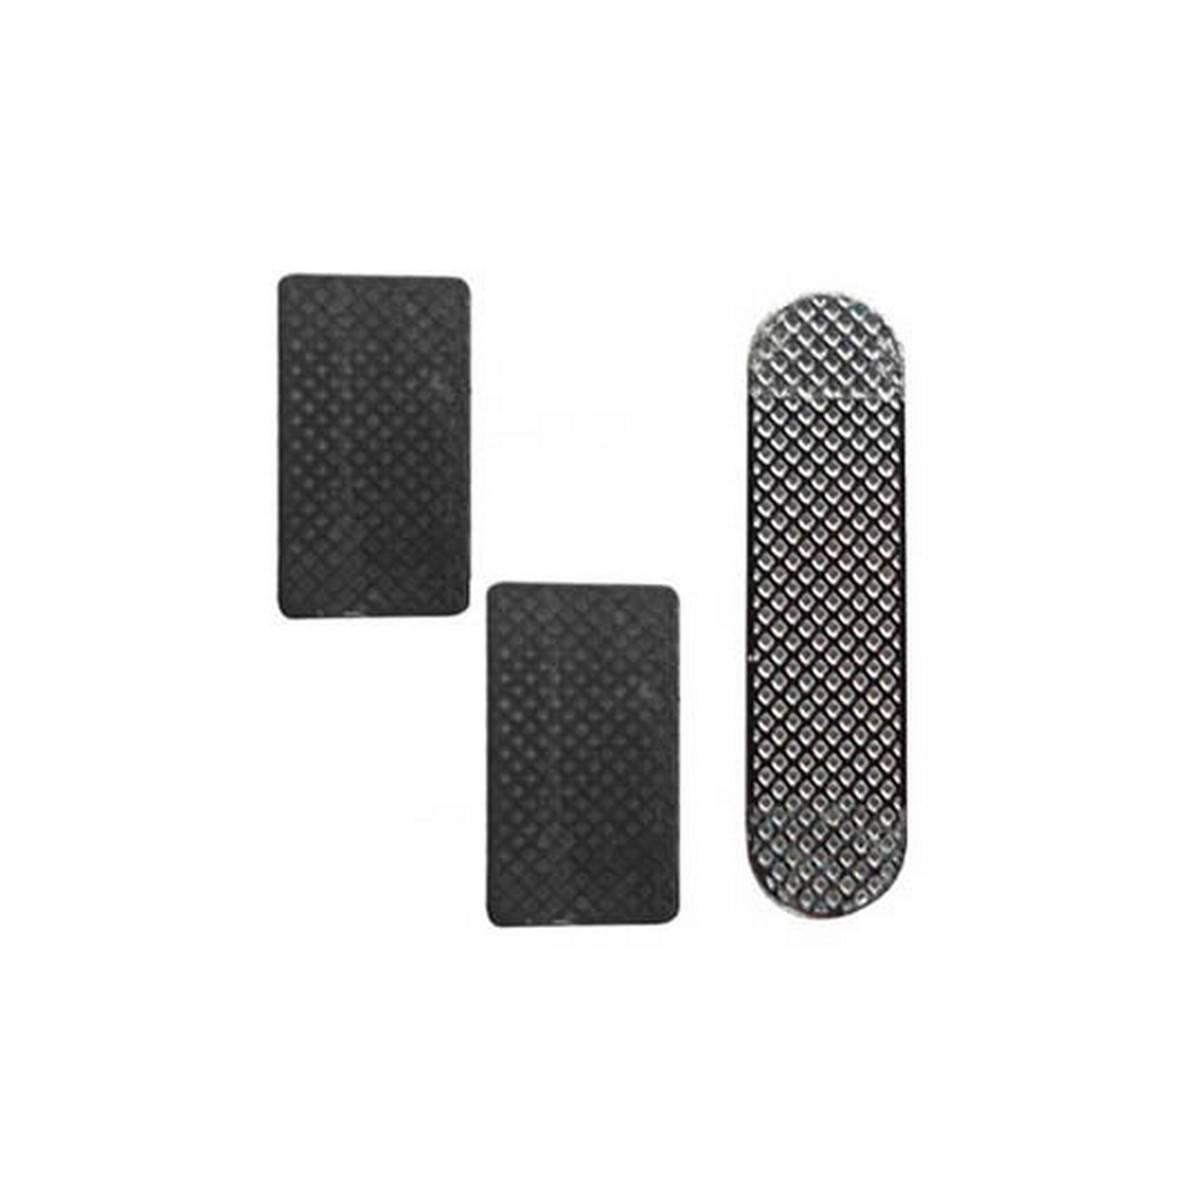 Rejillas guarda polvo de microfono, altavoz e anti dust para iphone 4